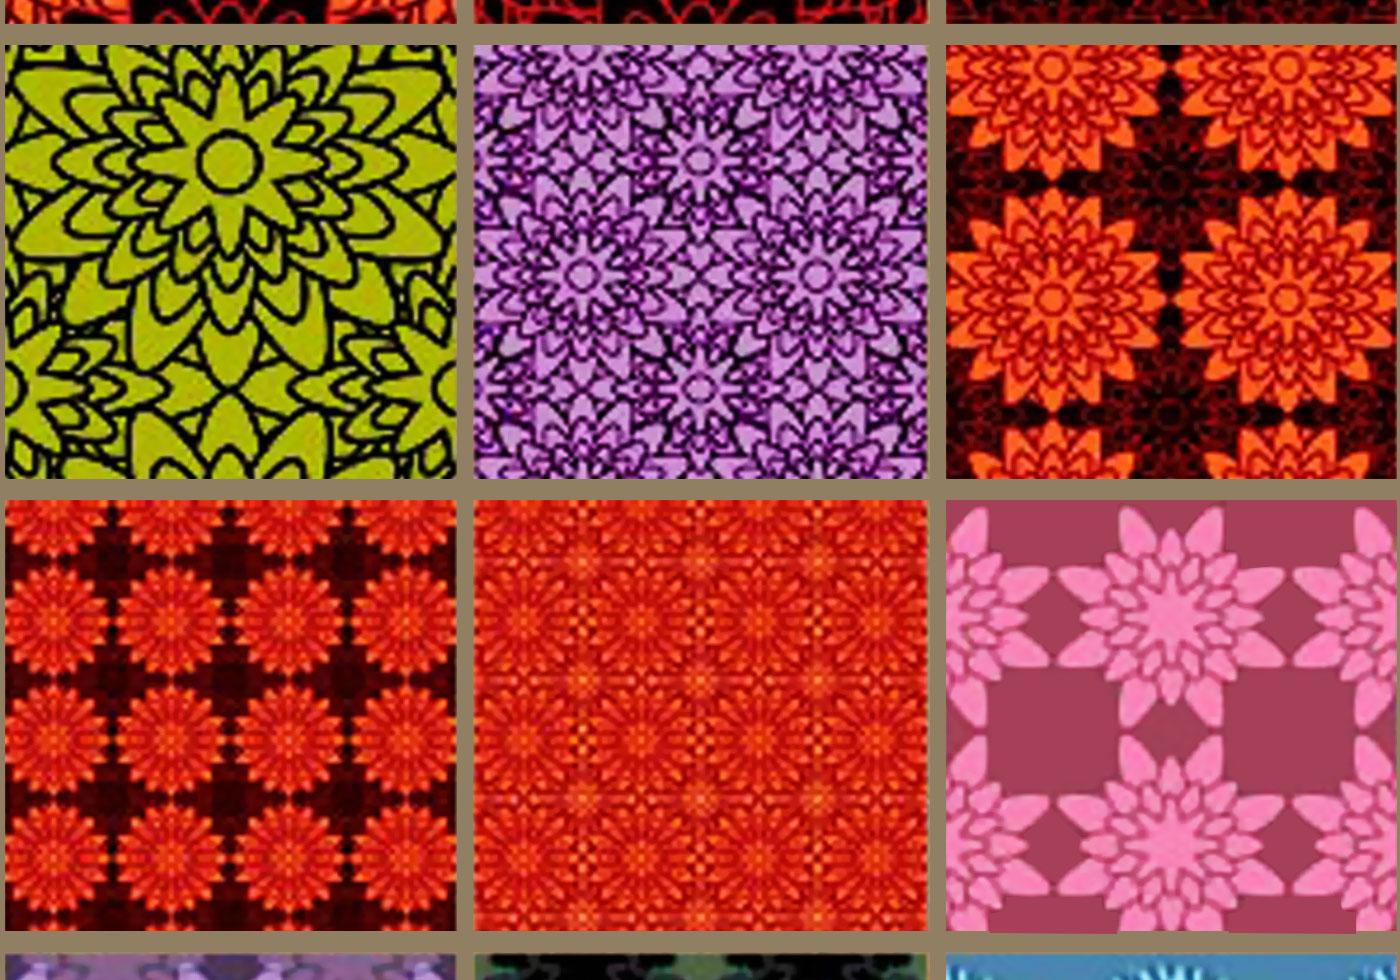 Cute Mandala Wallpaper Photoshop Patterns Pack 05 Free Photoshop Brushes At